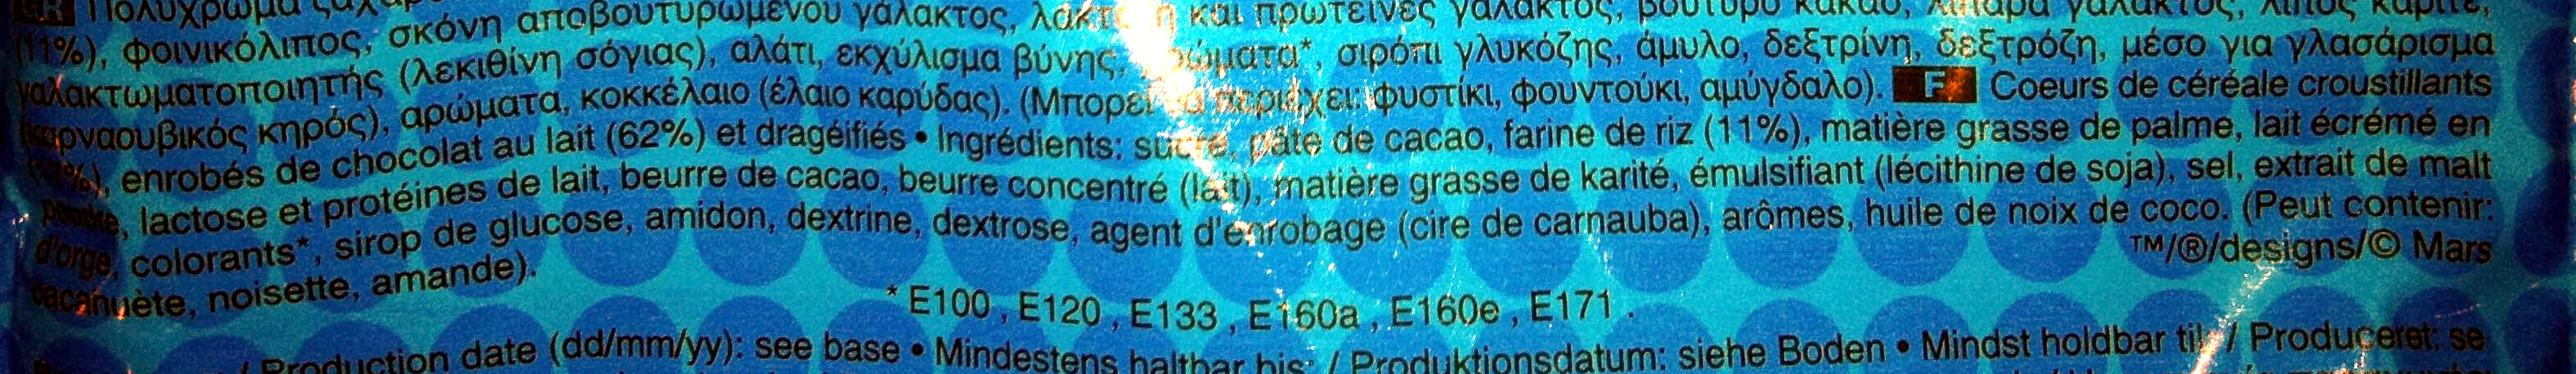 M &M'S Crispy - Ingrédients - fr